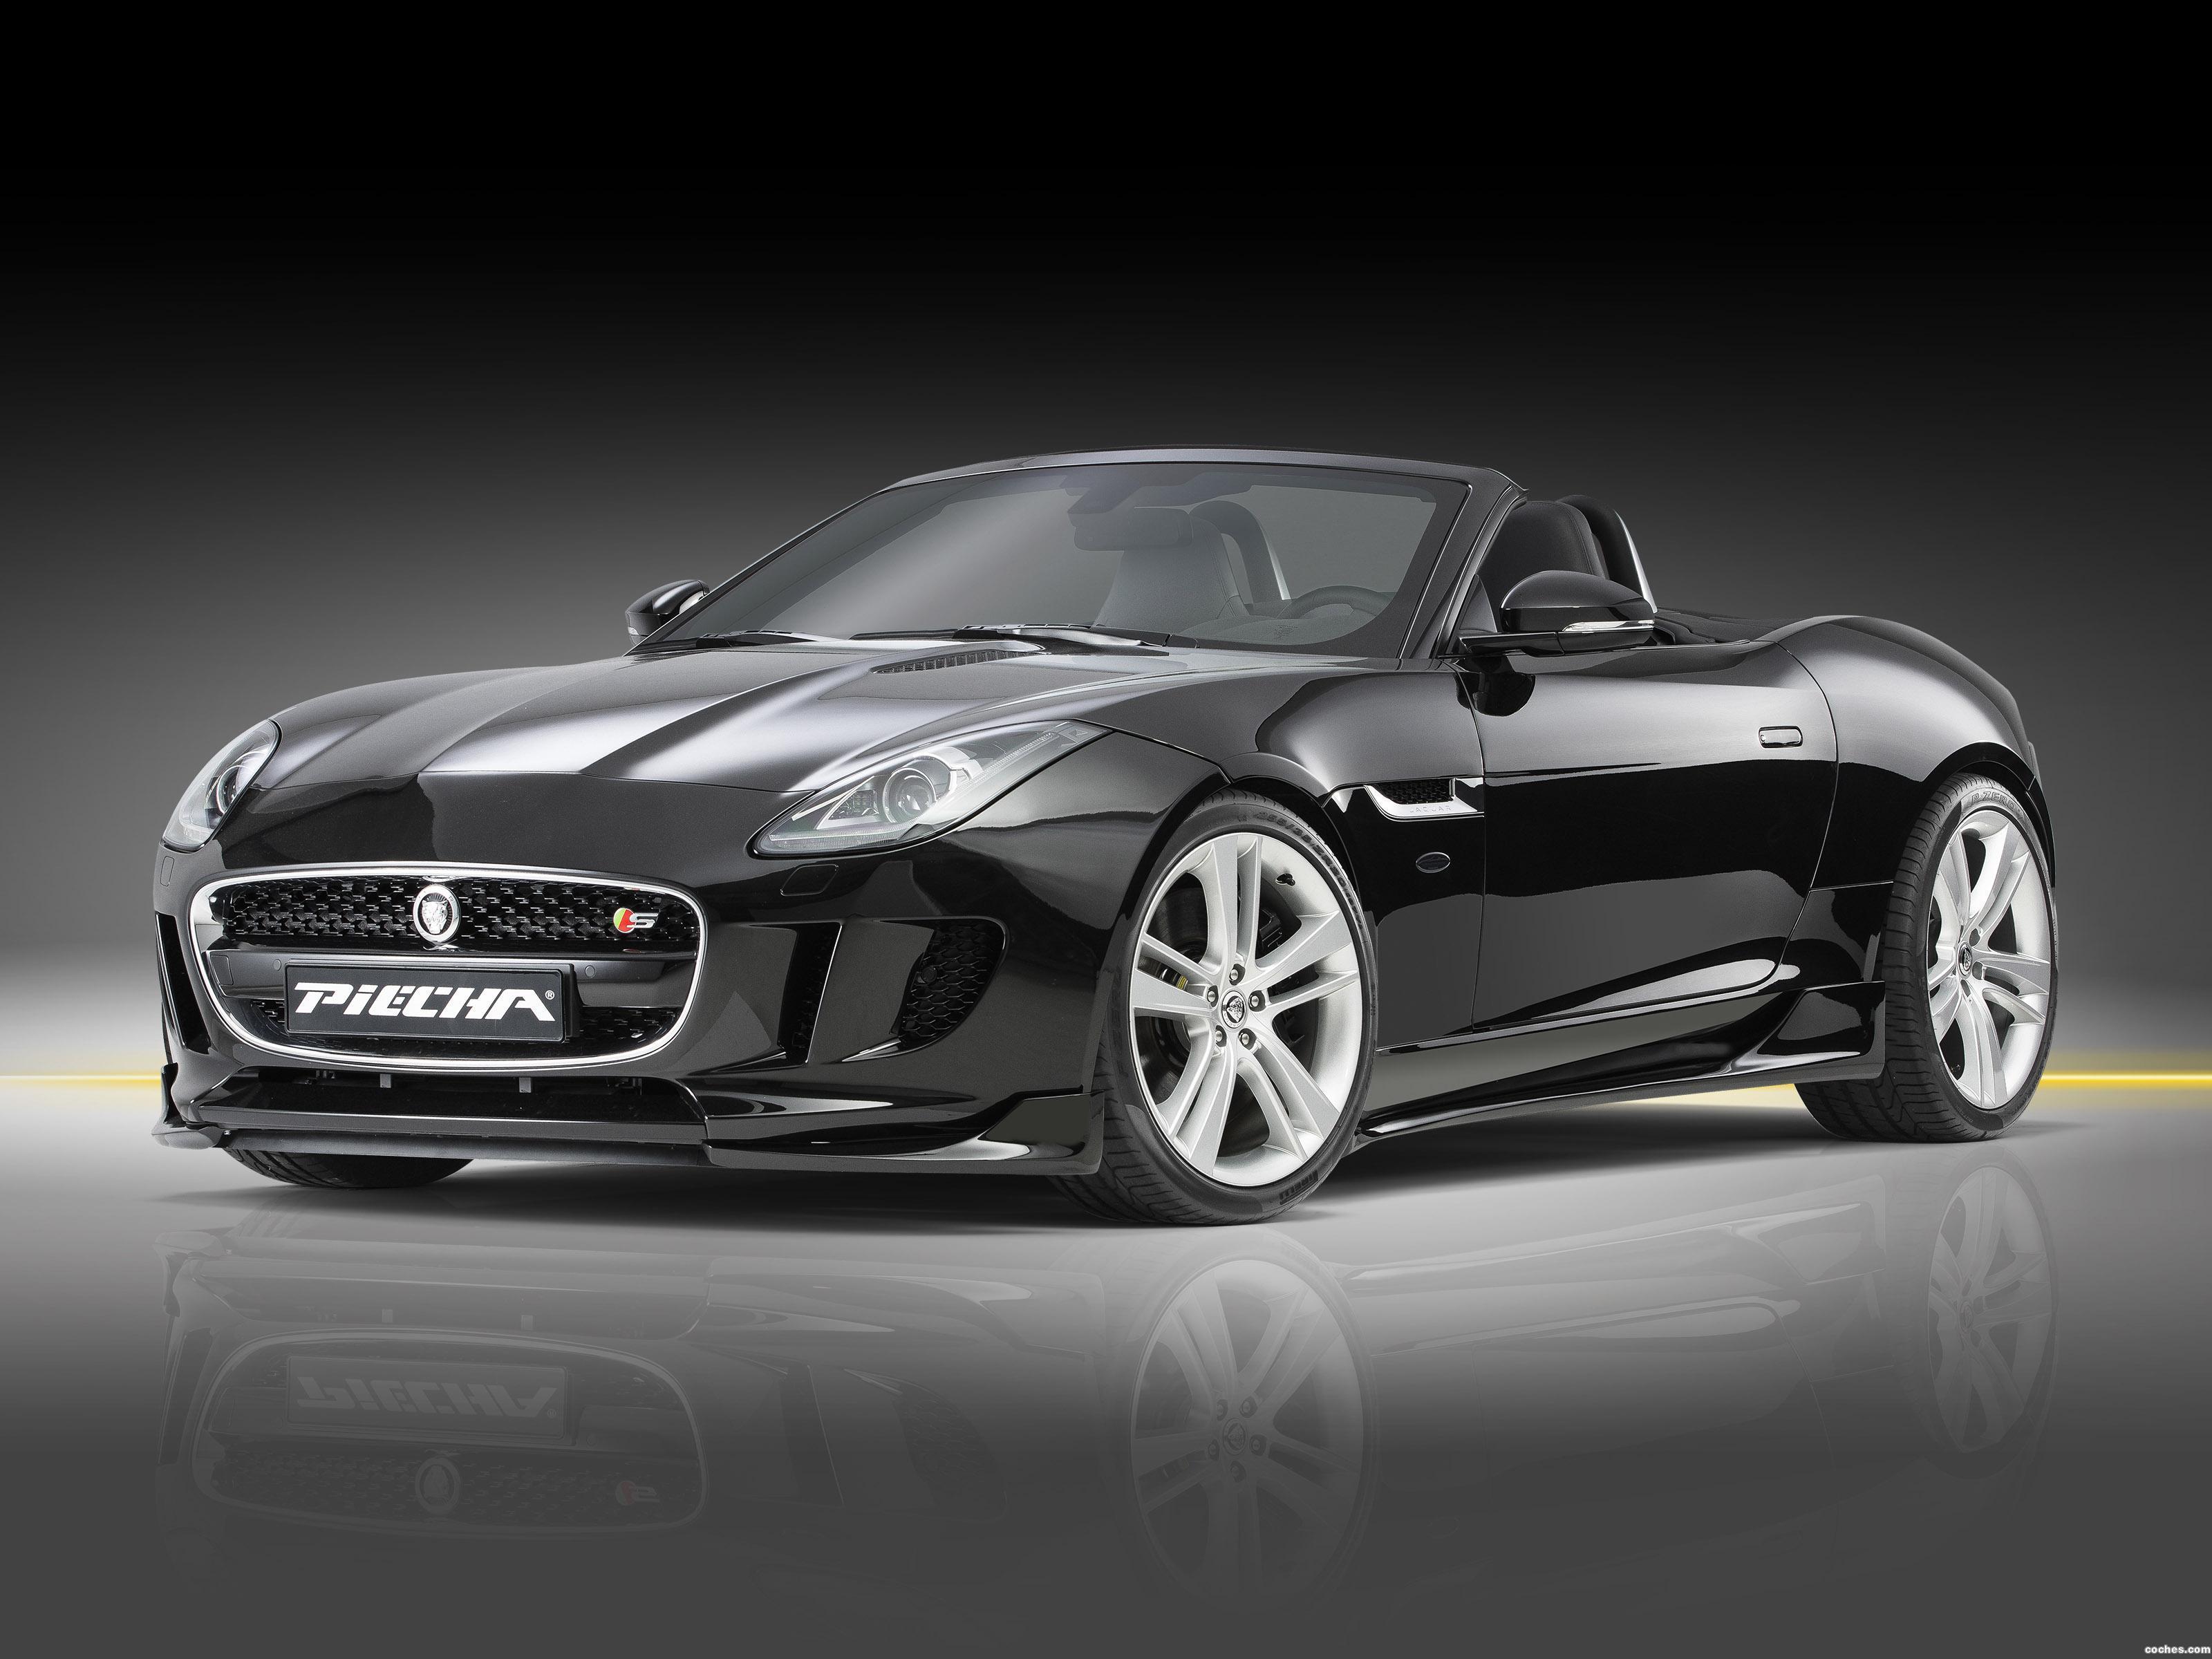 piecha-design_jaguar-f-type-v8-s-convertible-2016_r3.jpg